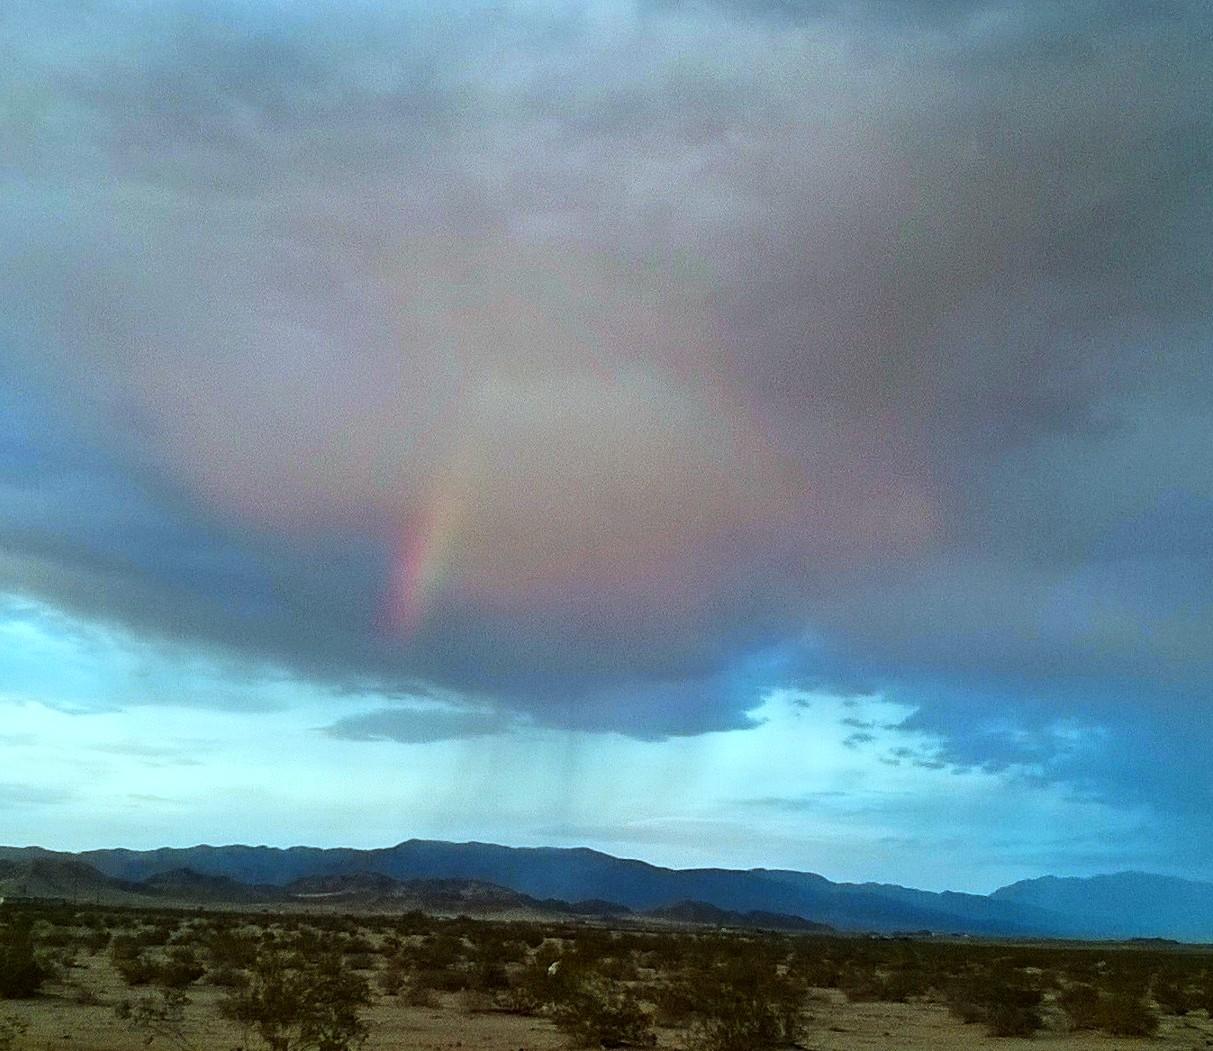 A rainbow at sunset...amazing!